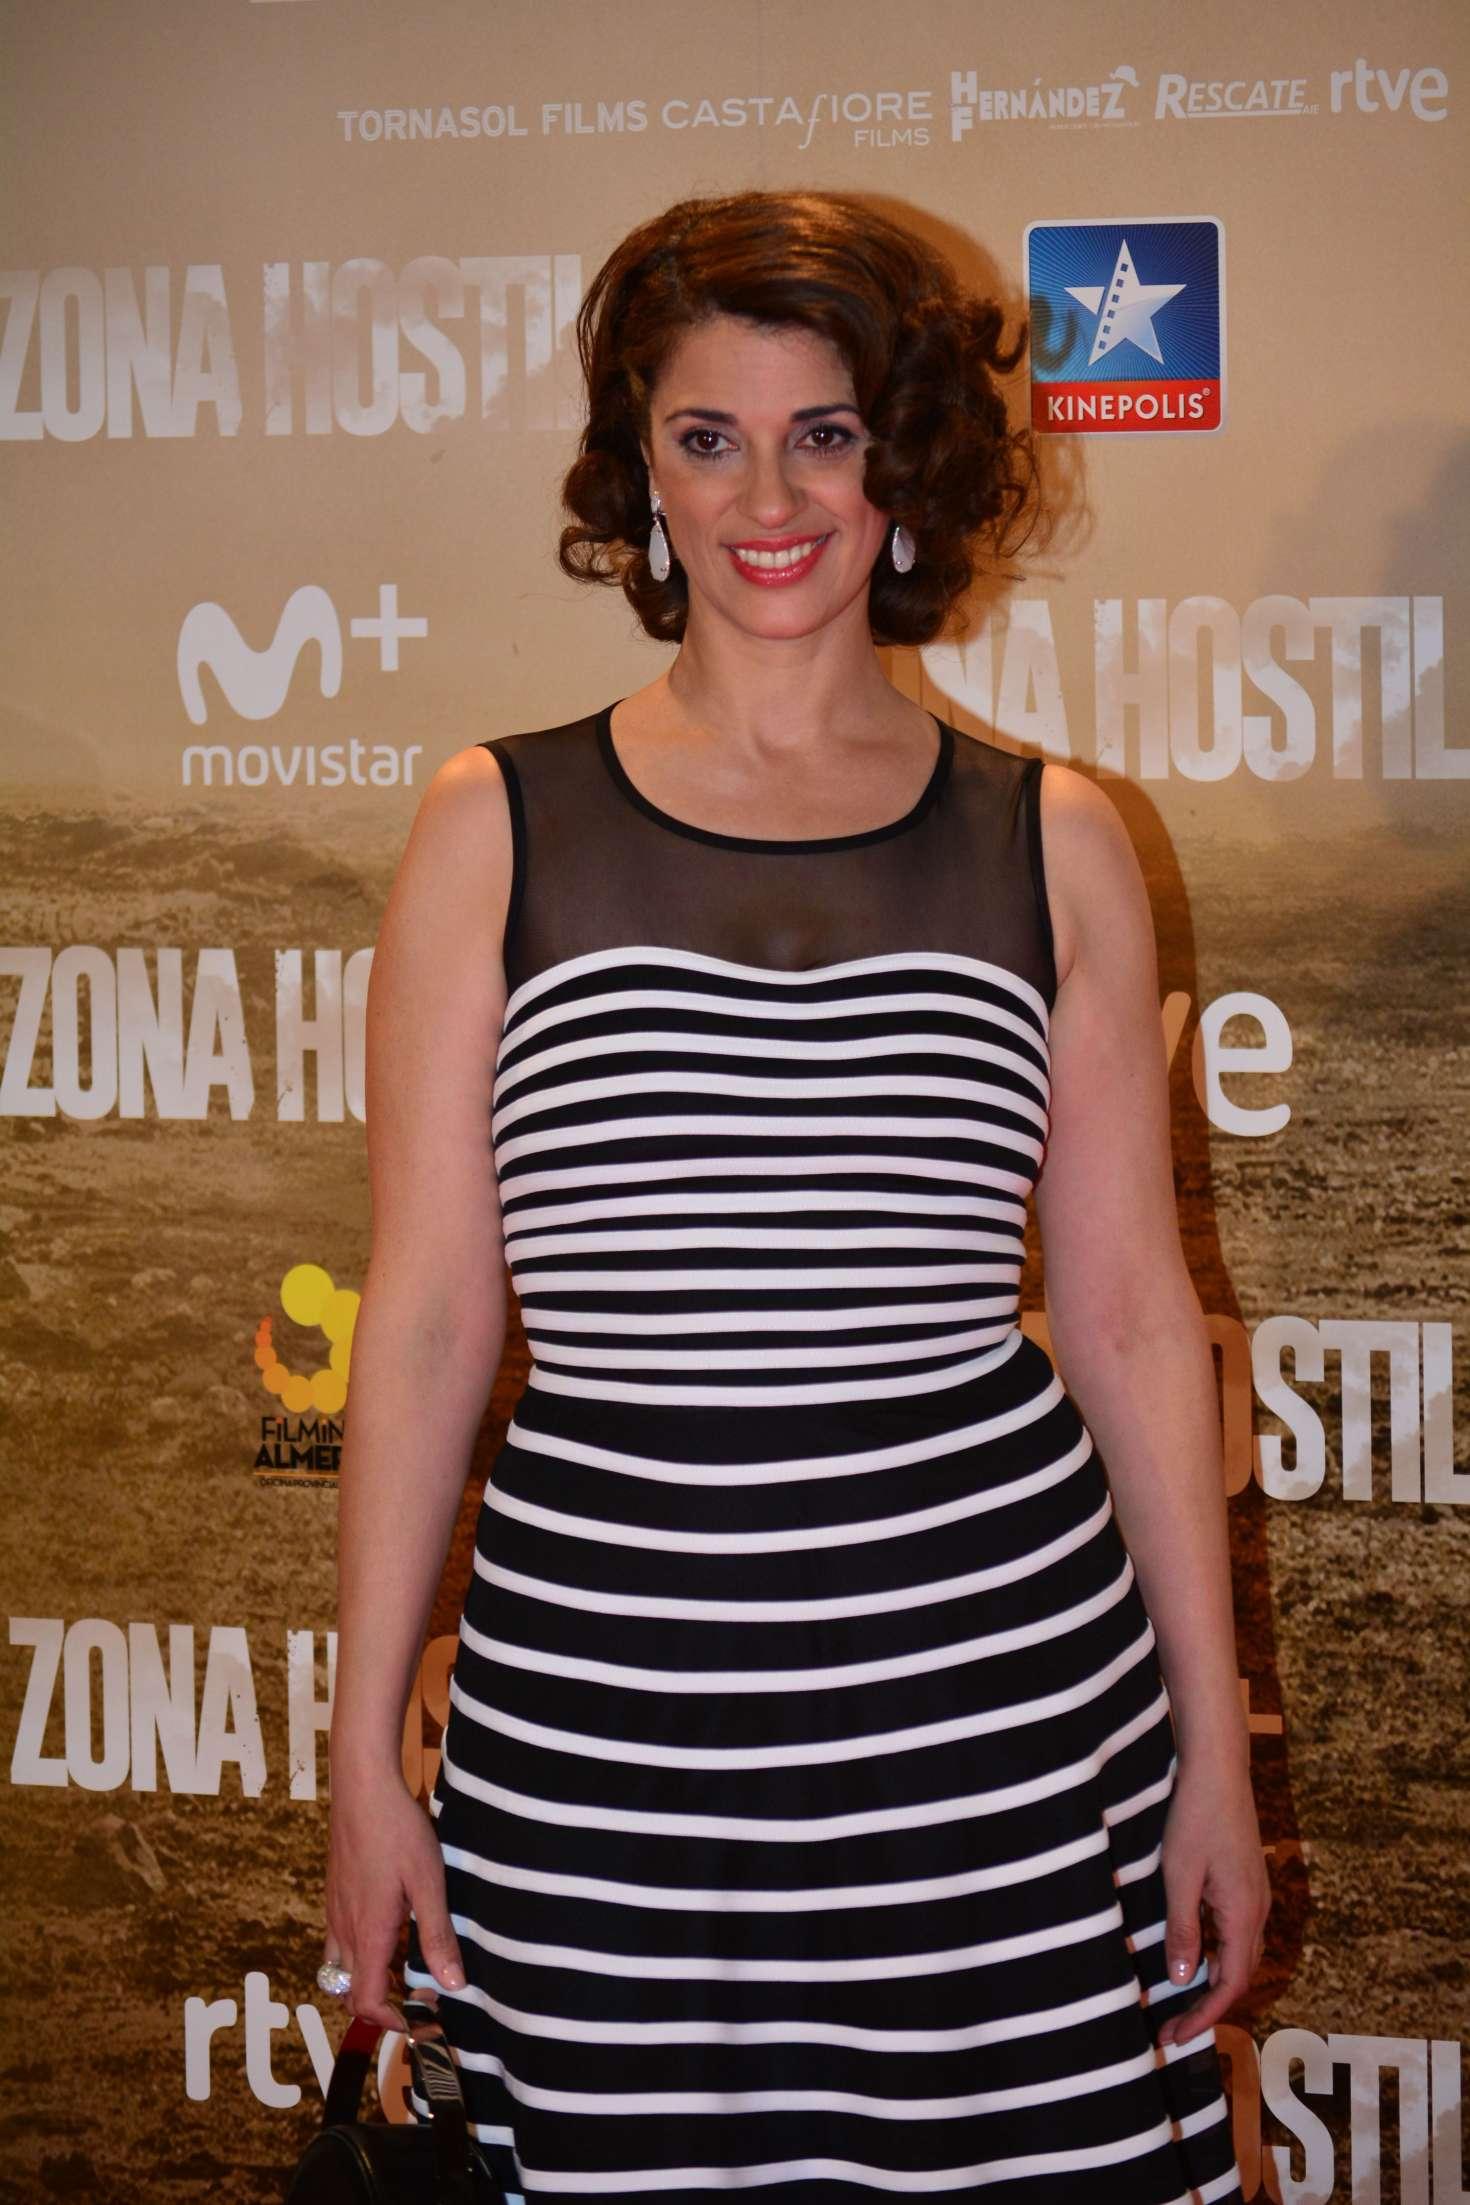 Ruth Gabriel - 'Zona Hostil' Premiere in Madrid